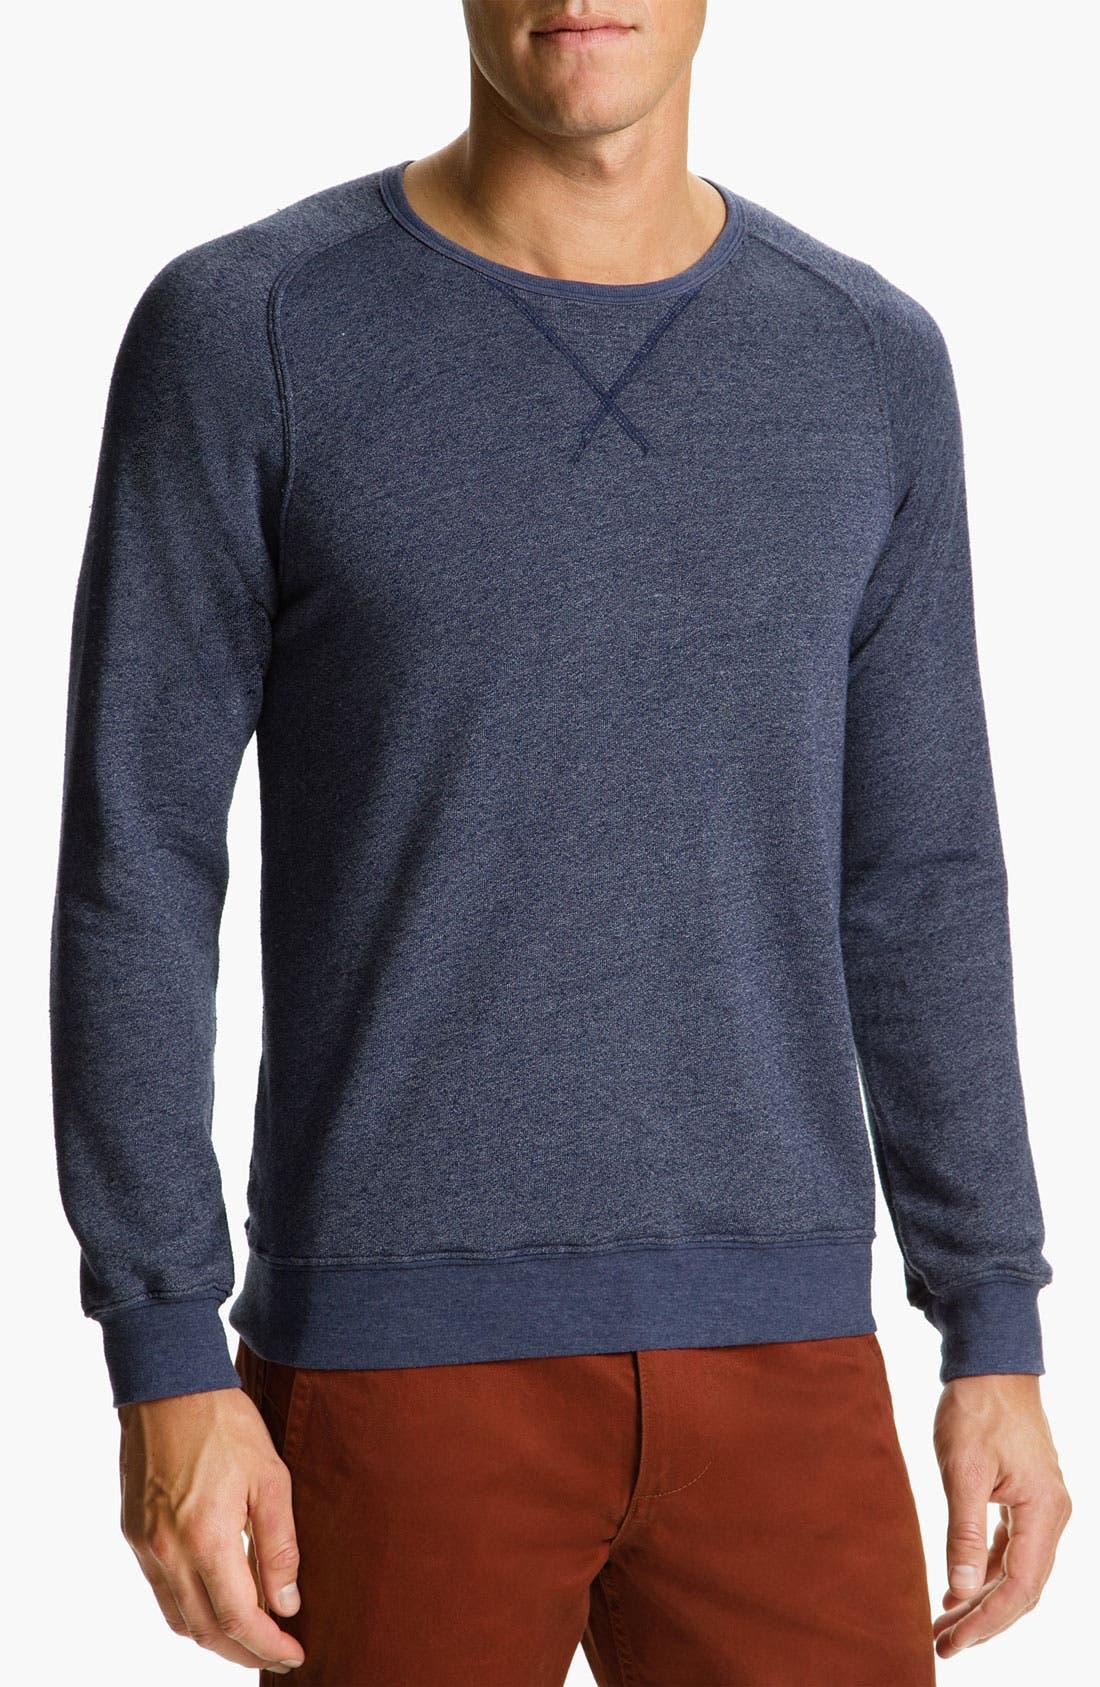 Main Image - Riviera Club 'Mira Mar' Crewneck Sweatshirt